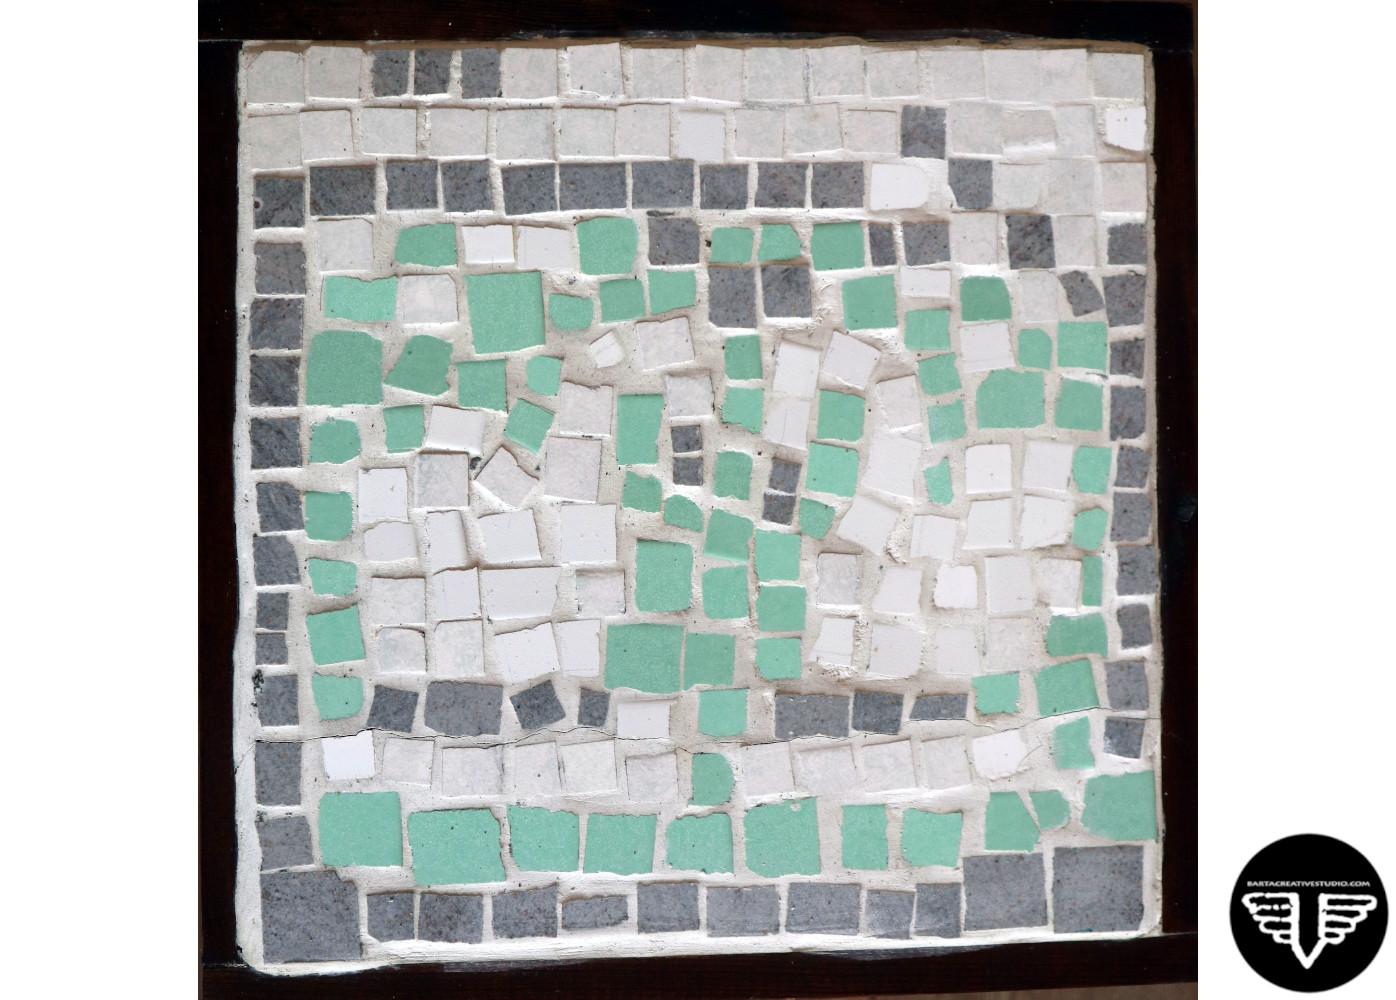 mozaikos_asztal.JPG